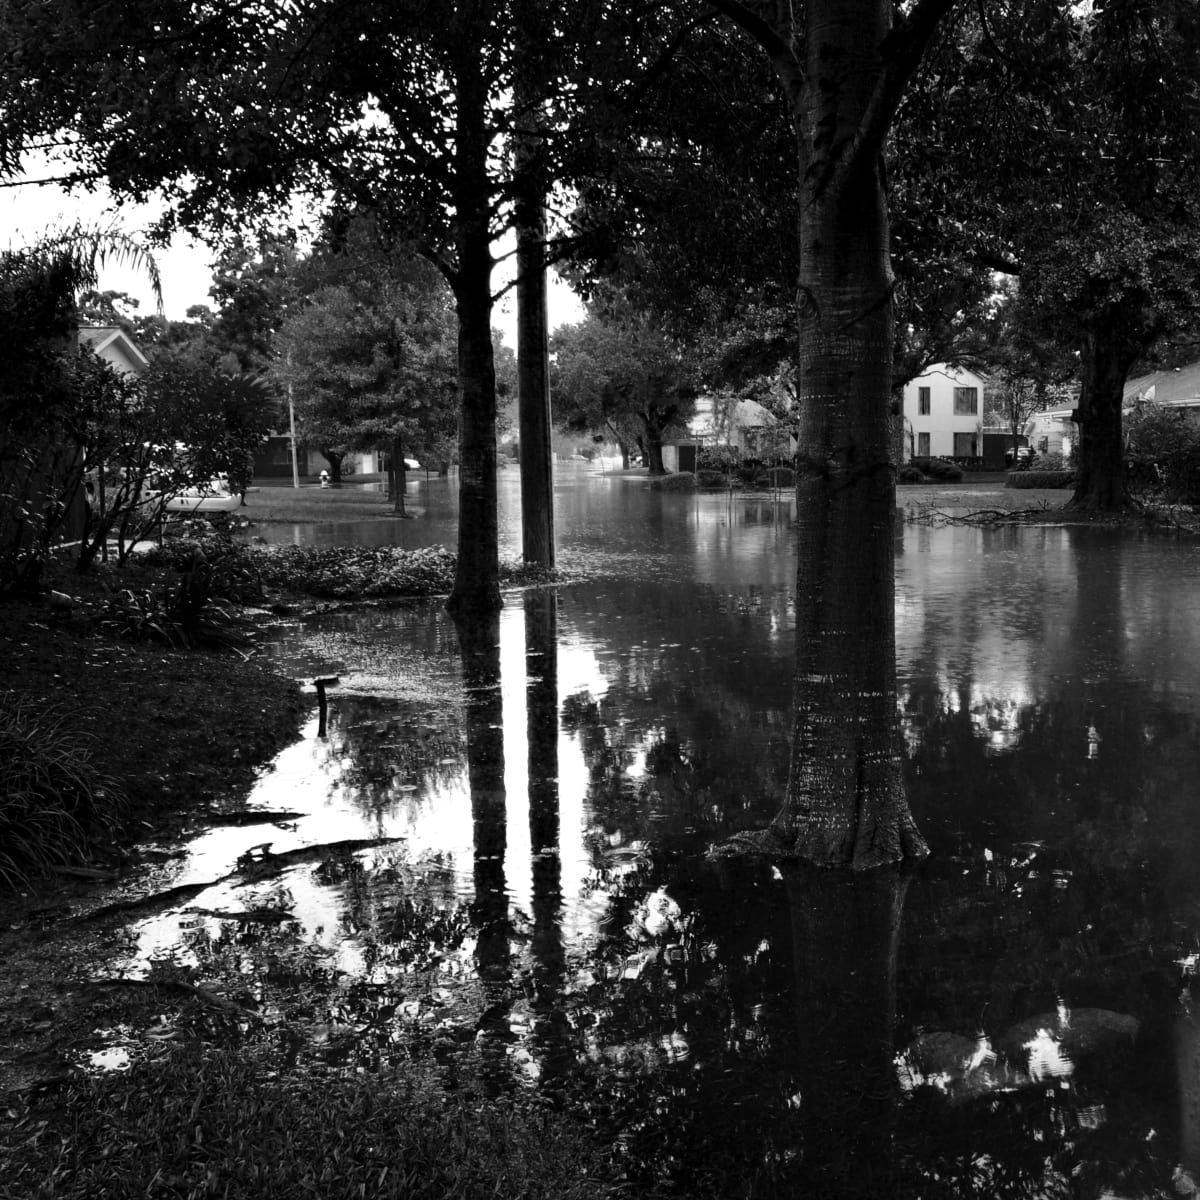 MFAH: Eye on Houston, Only Rivers